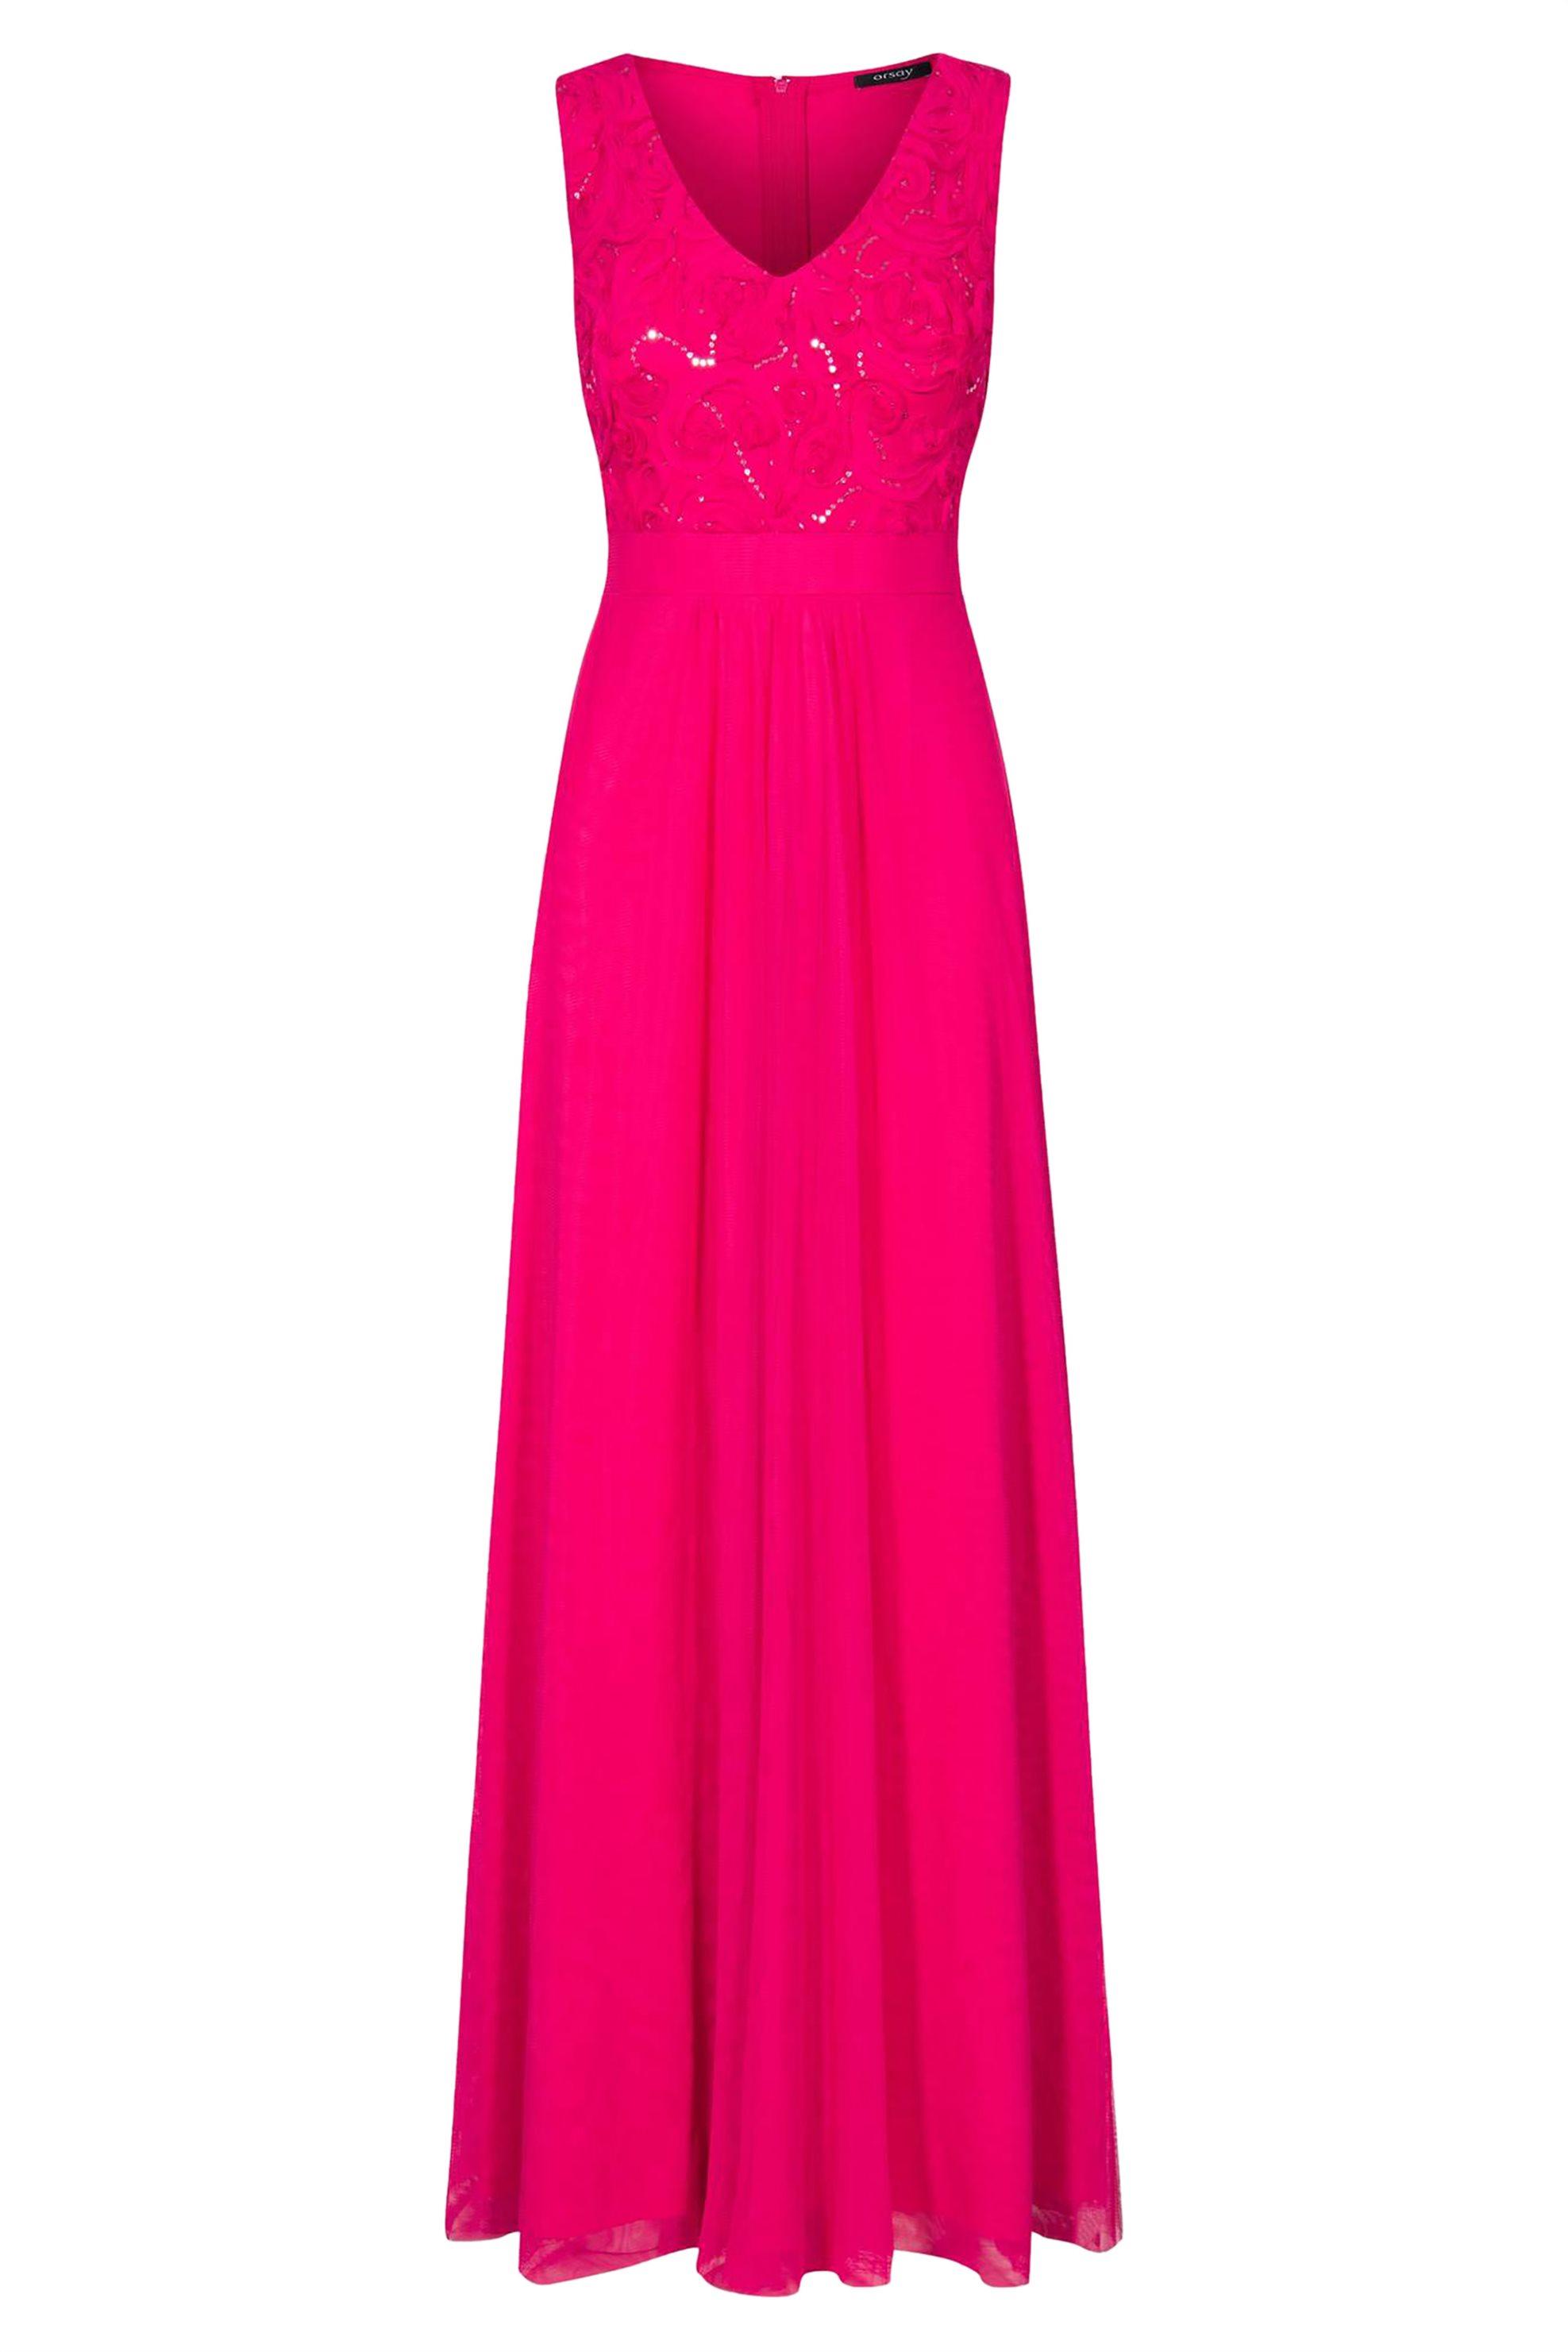 Orsay γυναικείο maxi φόρεμα με απλικέ λουλούδια στο μπούστο - 467104-312000 - Φο γυναικα   ρουχα   φορέματα   maxi φορέματα